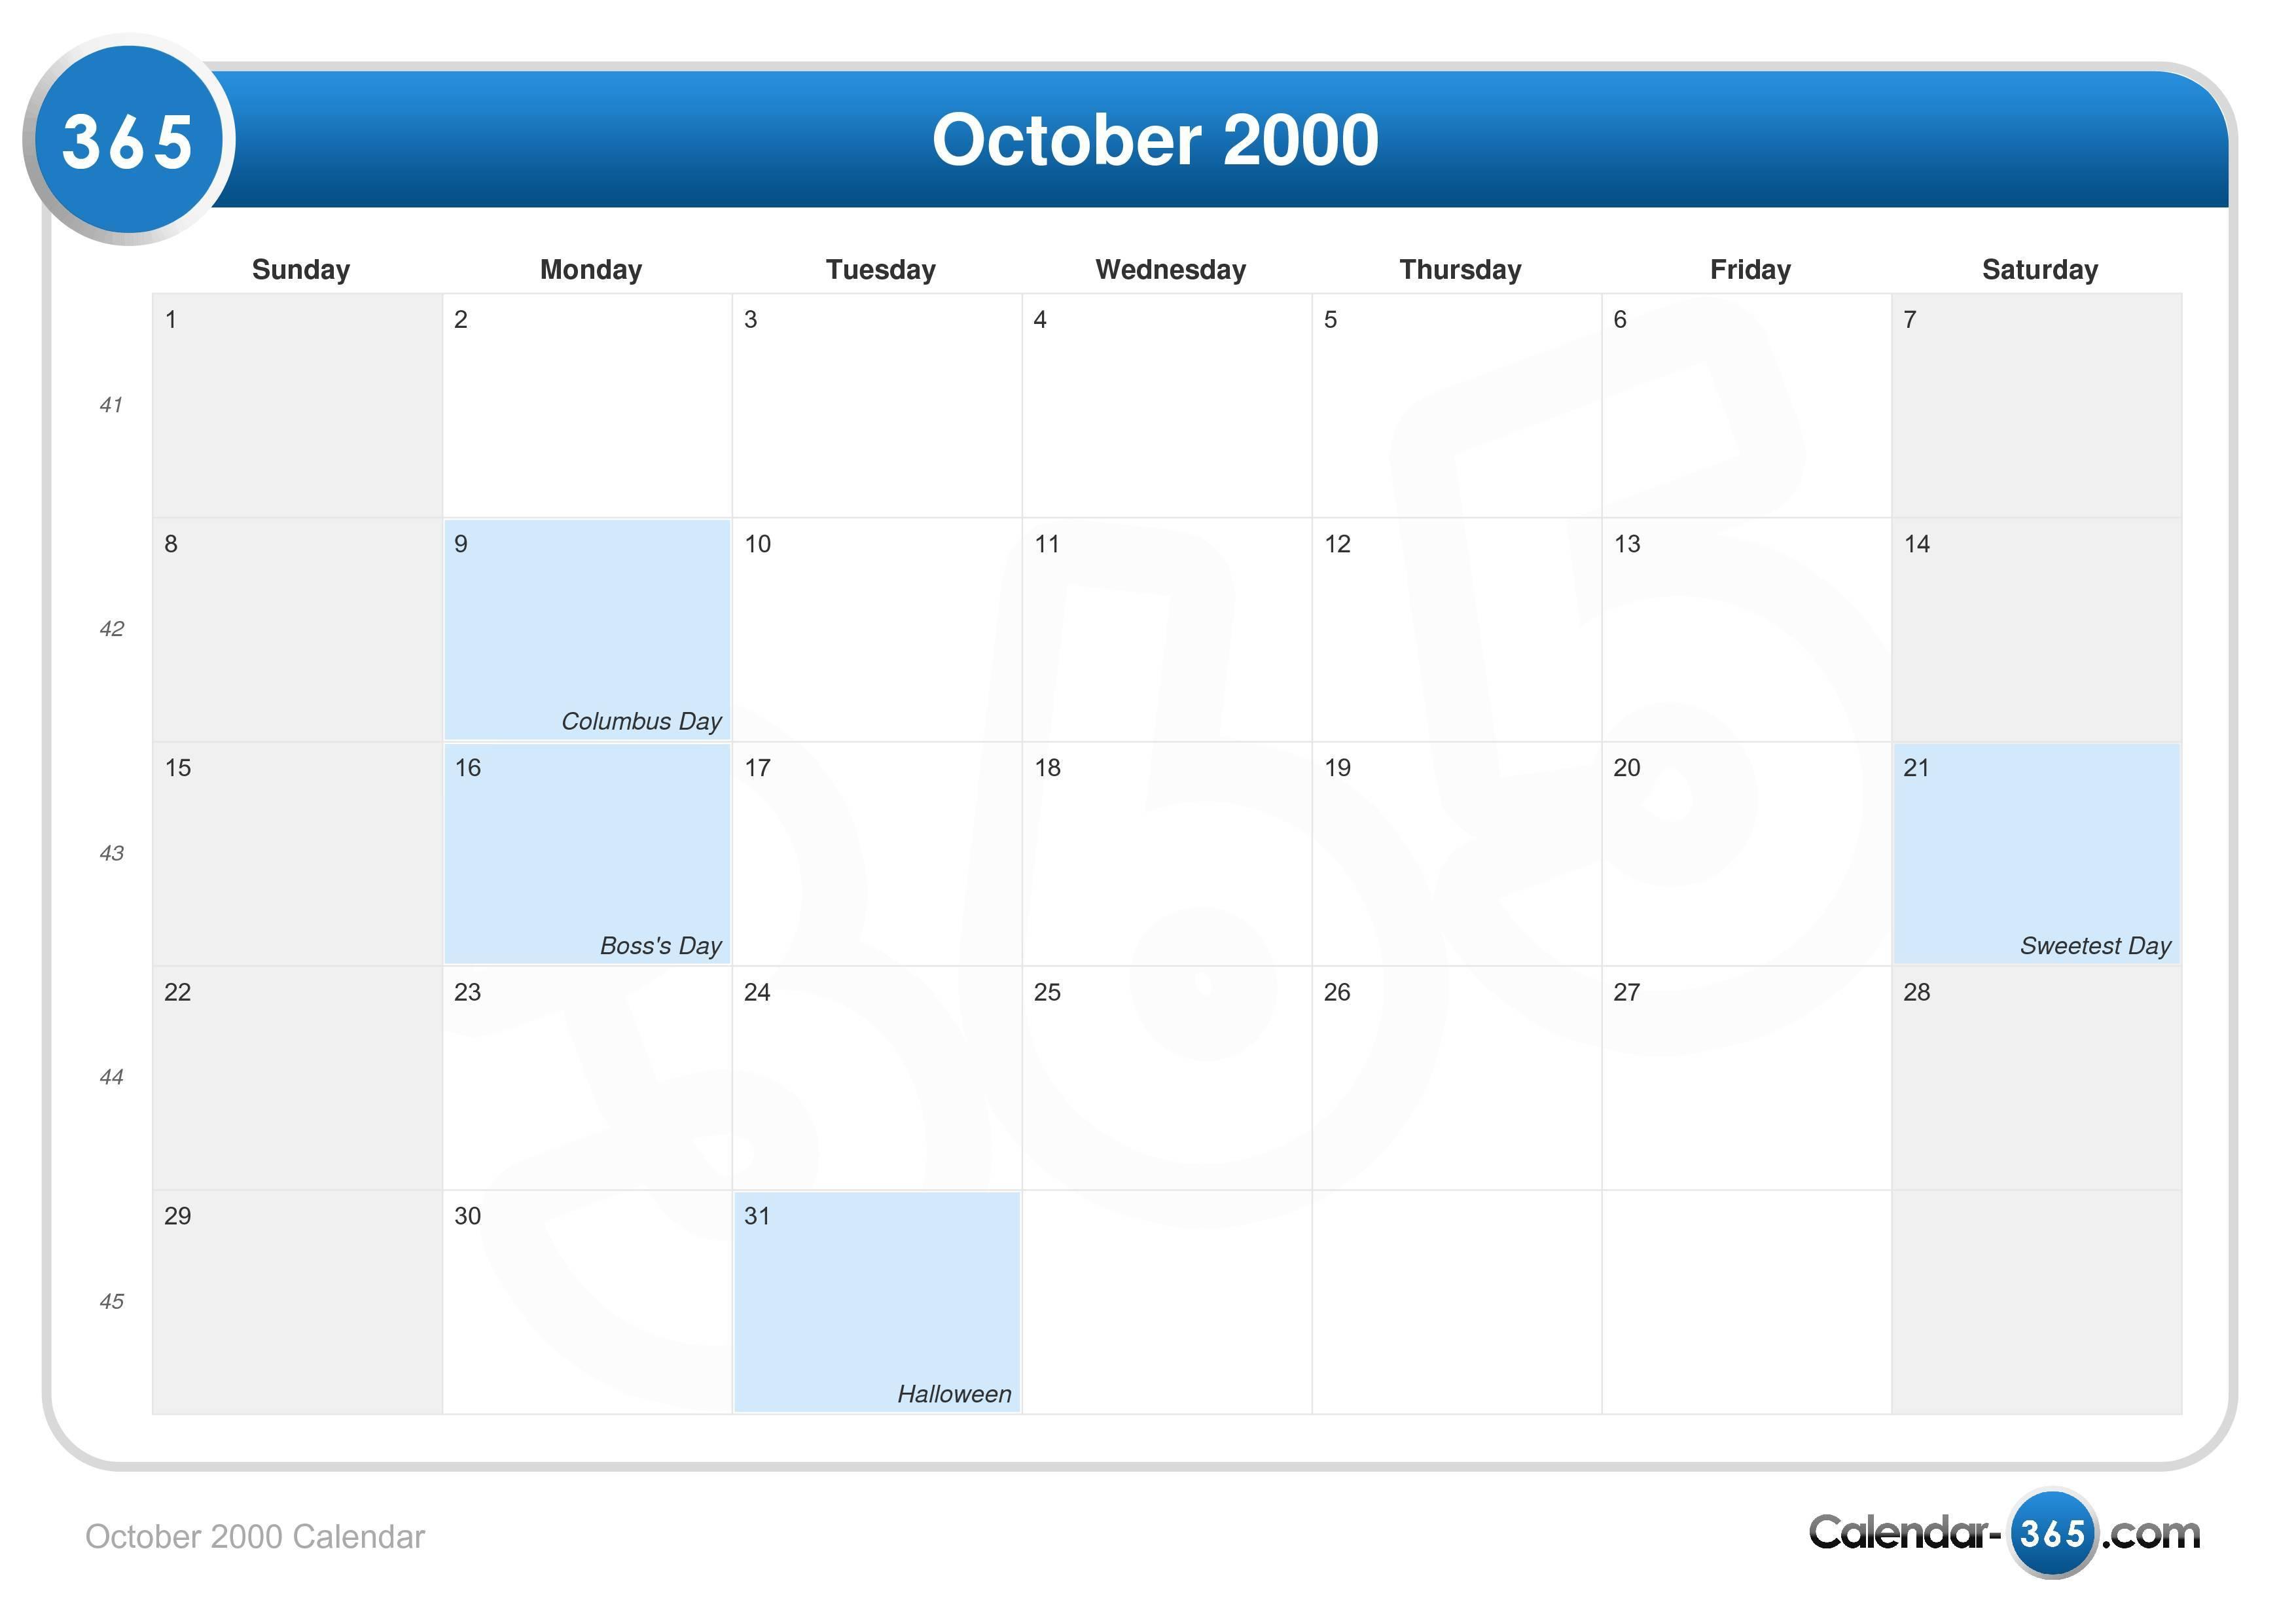 October 2000 Calendar in Catholic Calander For October 2019